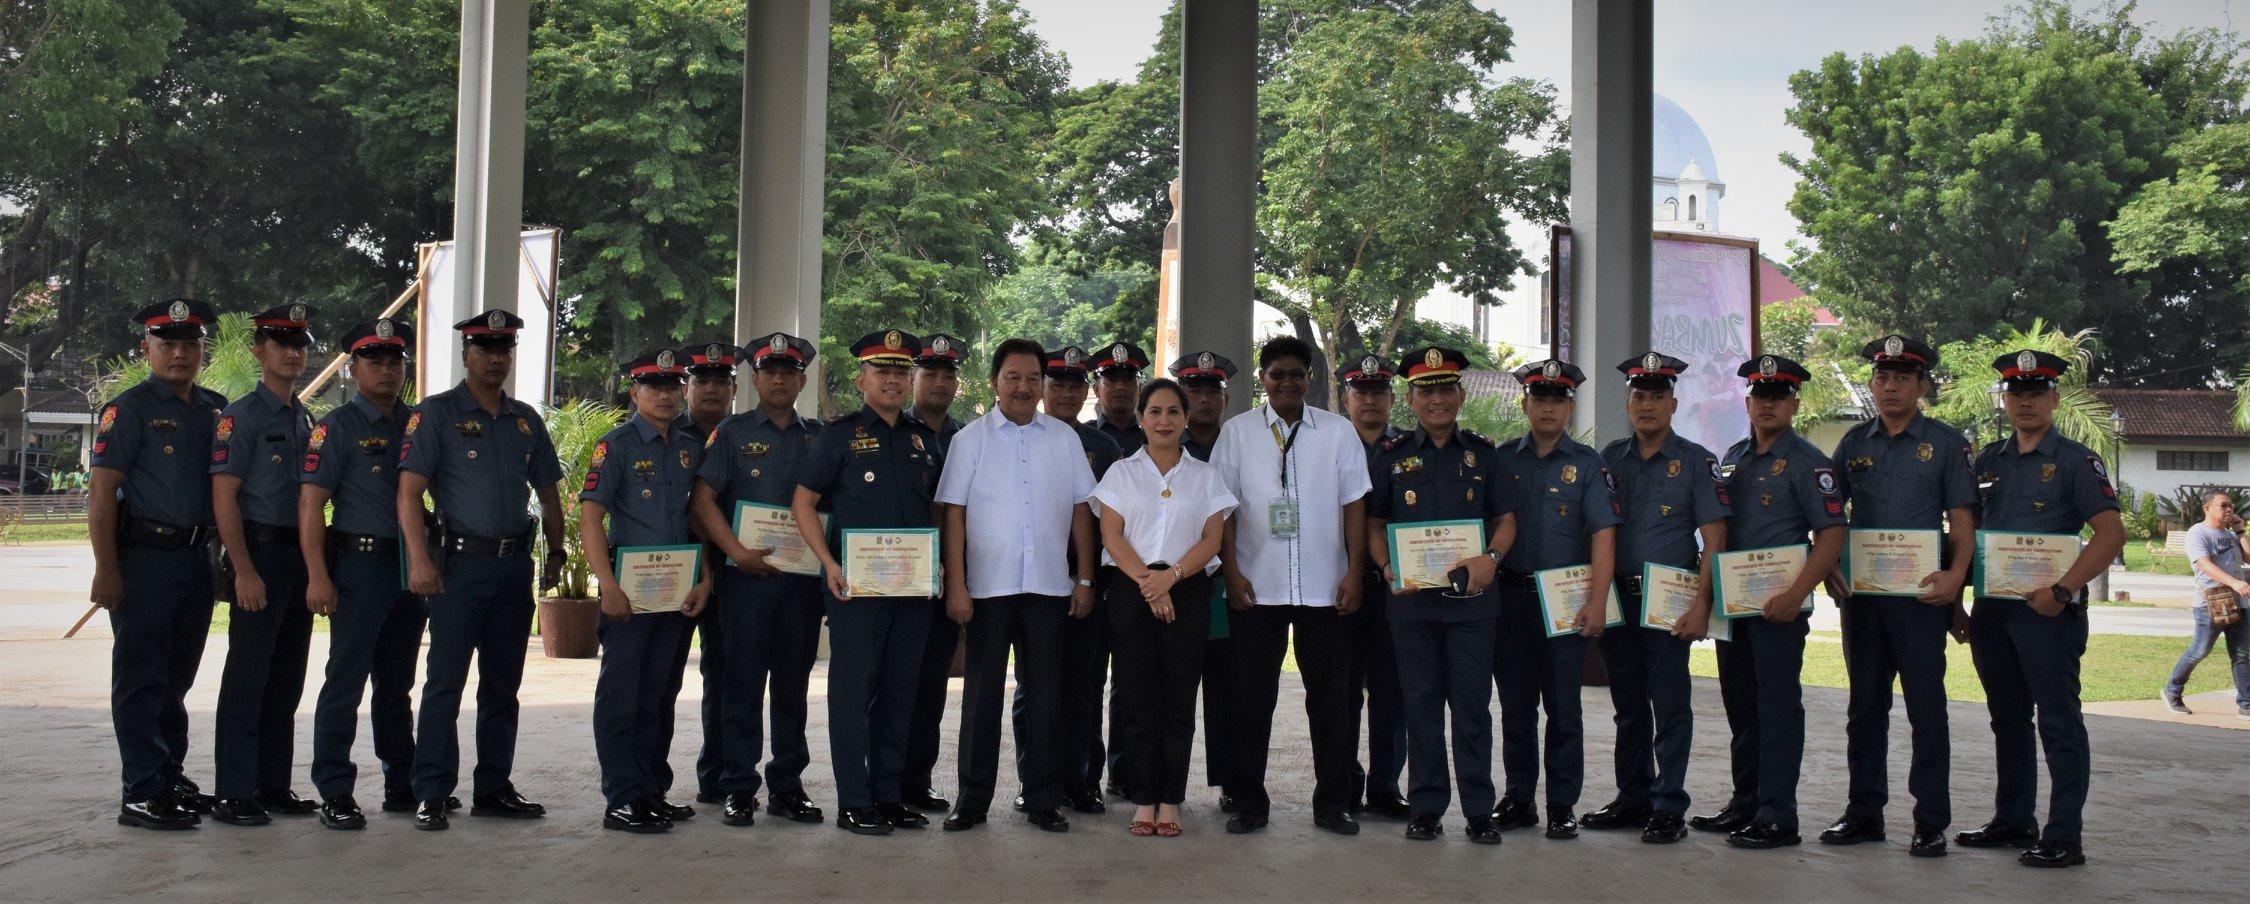 Batangas City Official Website - Eto Batangueño Disiplinado